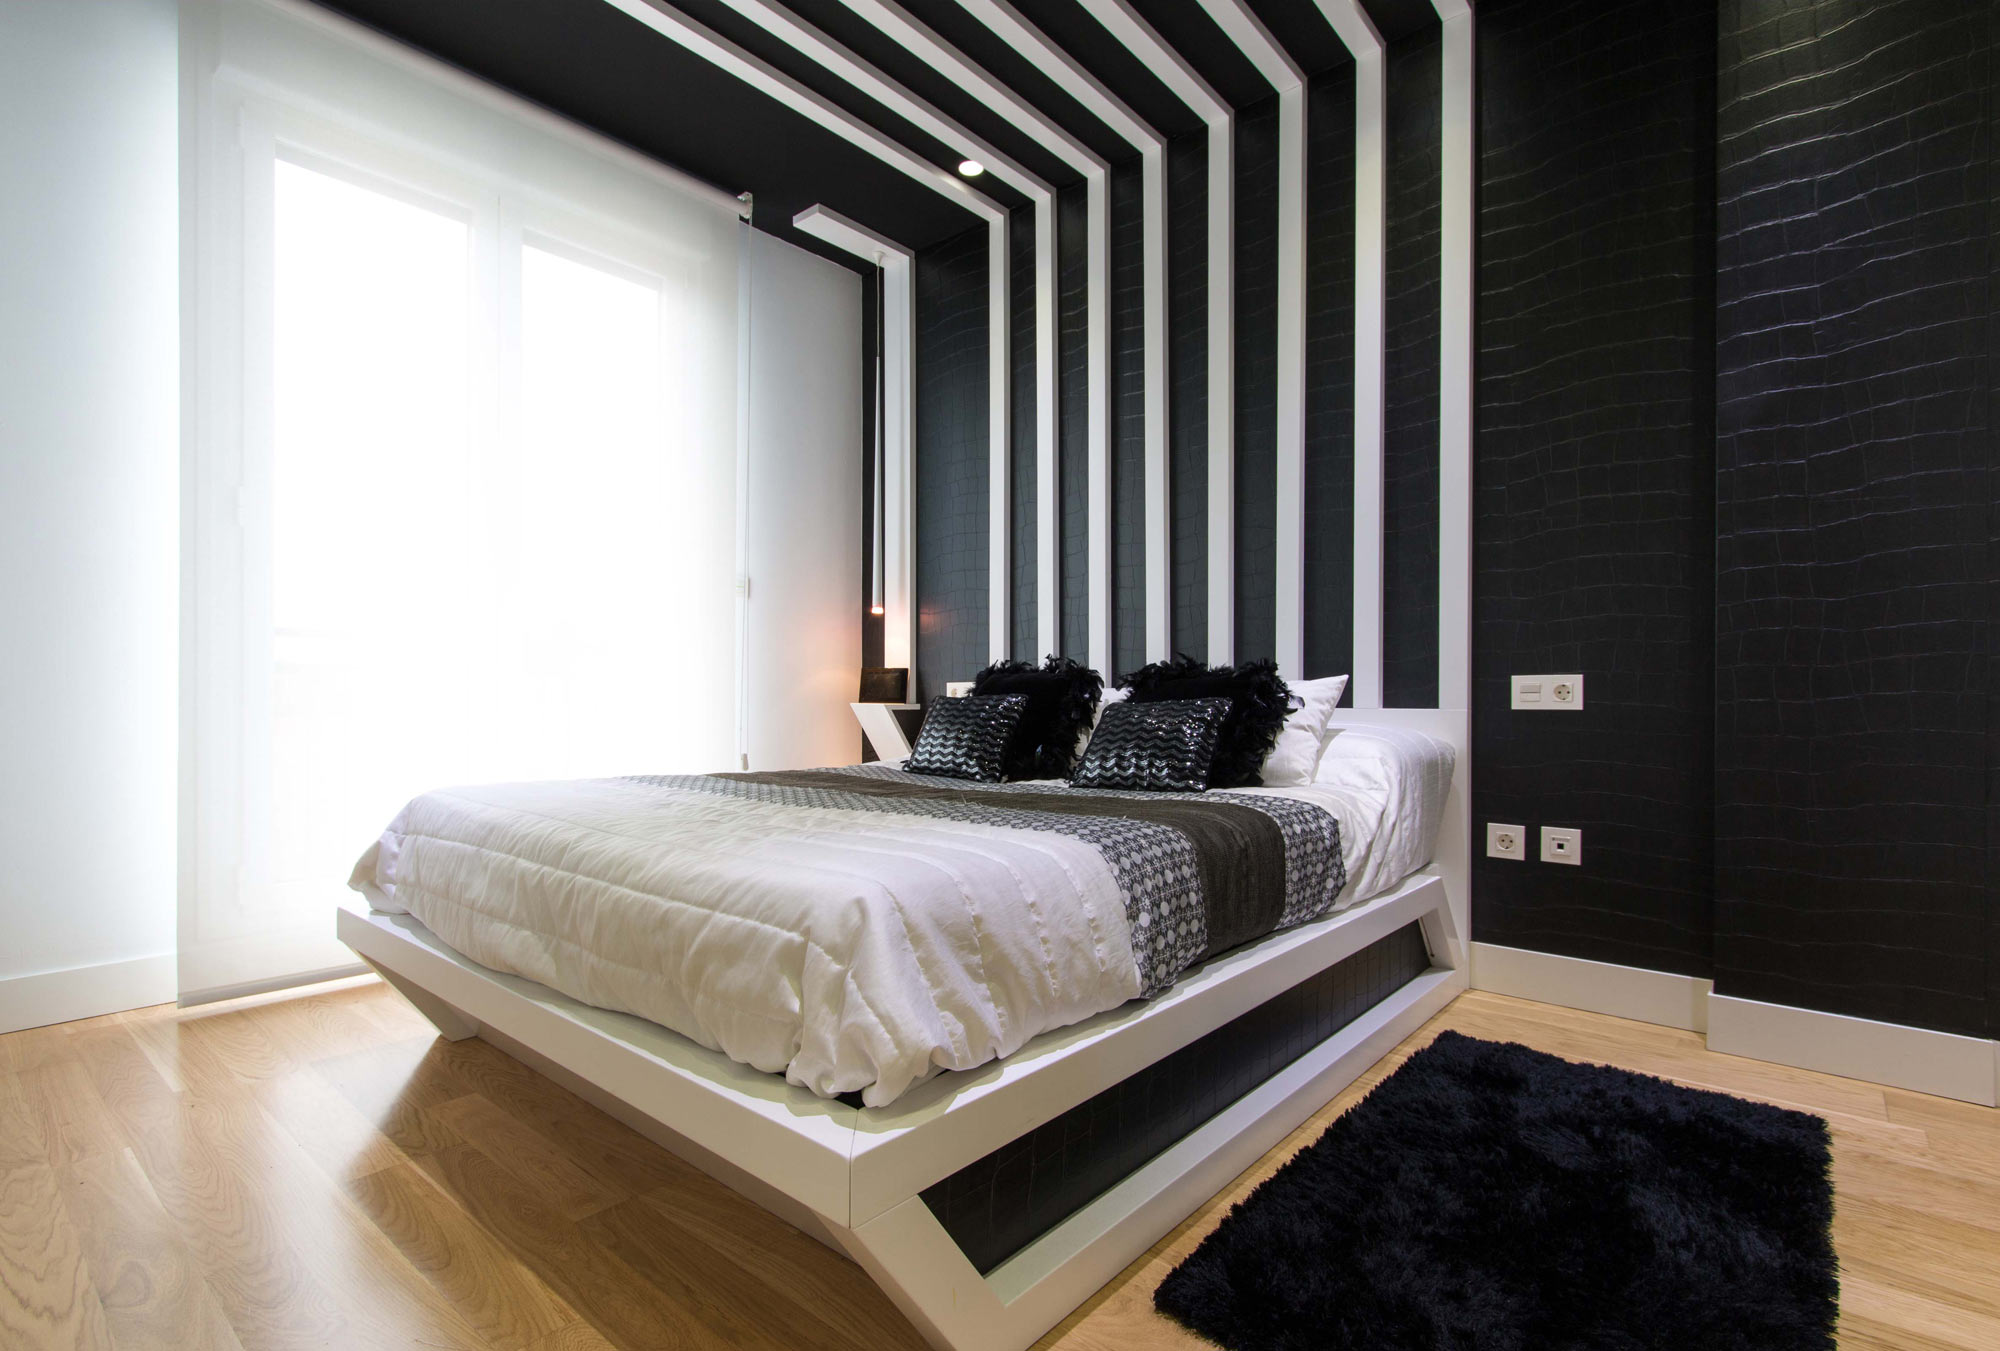 Adosado estilo n rdico interdecor bilbao for Papel pintado para muebles de madera